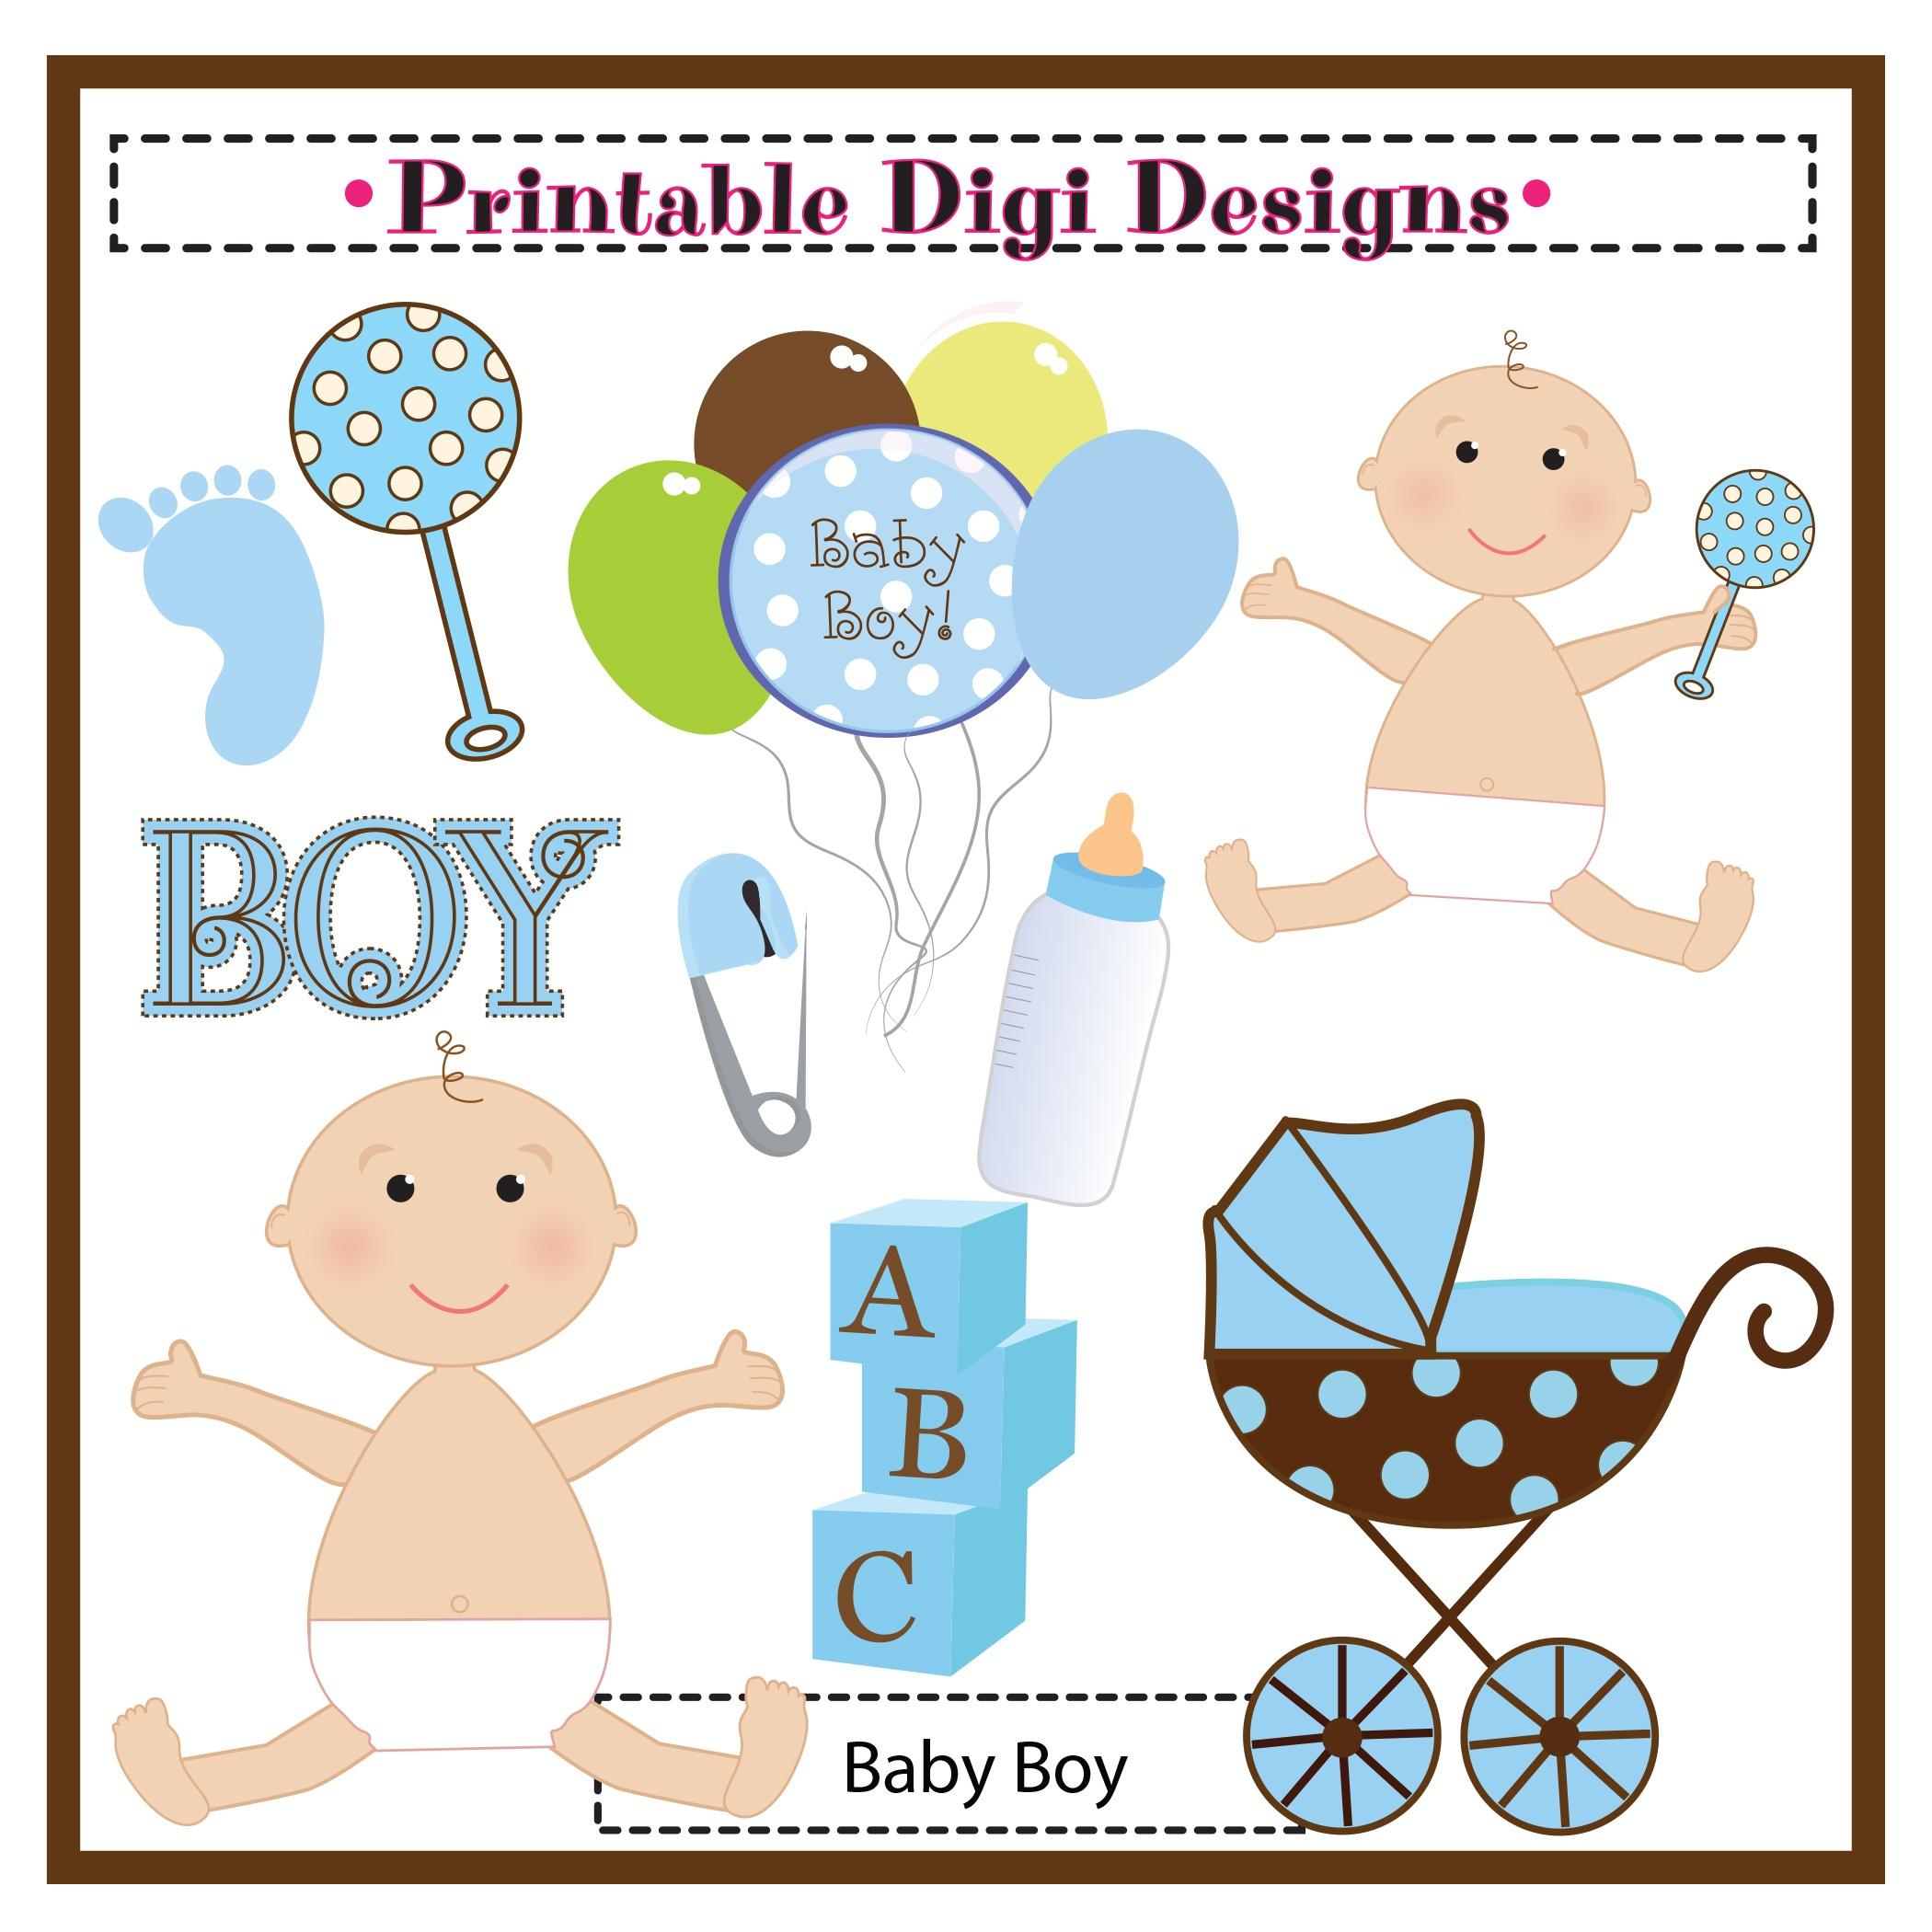 Photo : Free Printable Baby Shower Image - Free Printable Baby Shower Decorations For A Boy